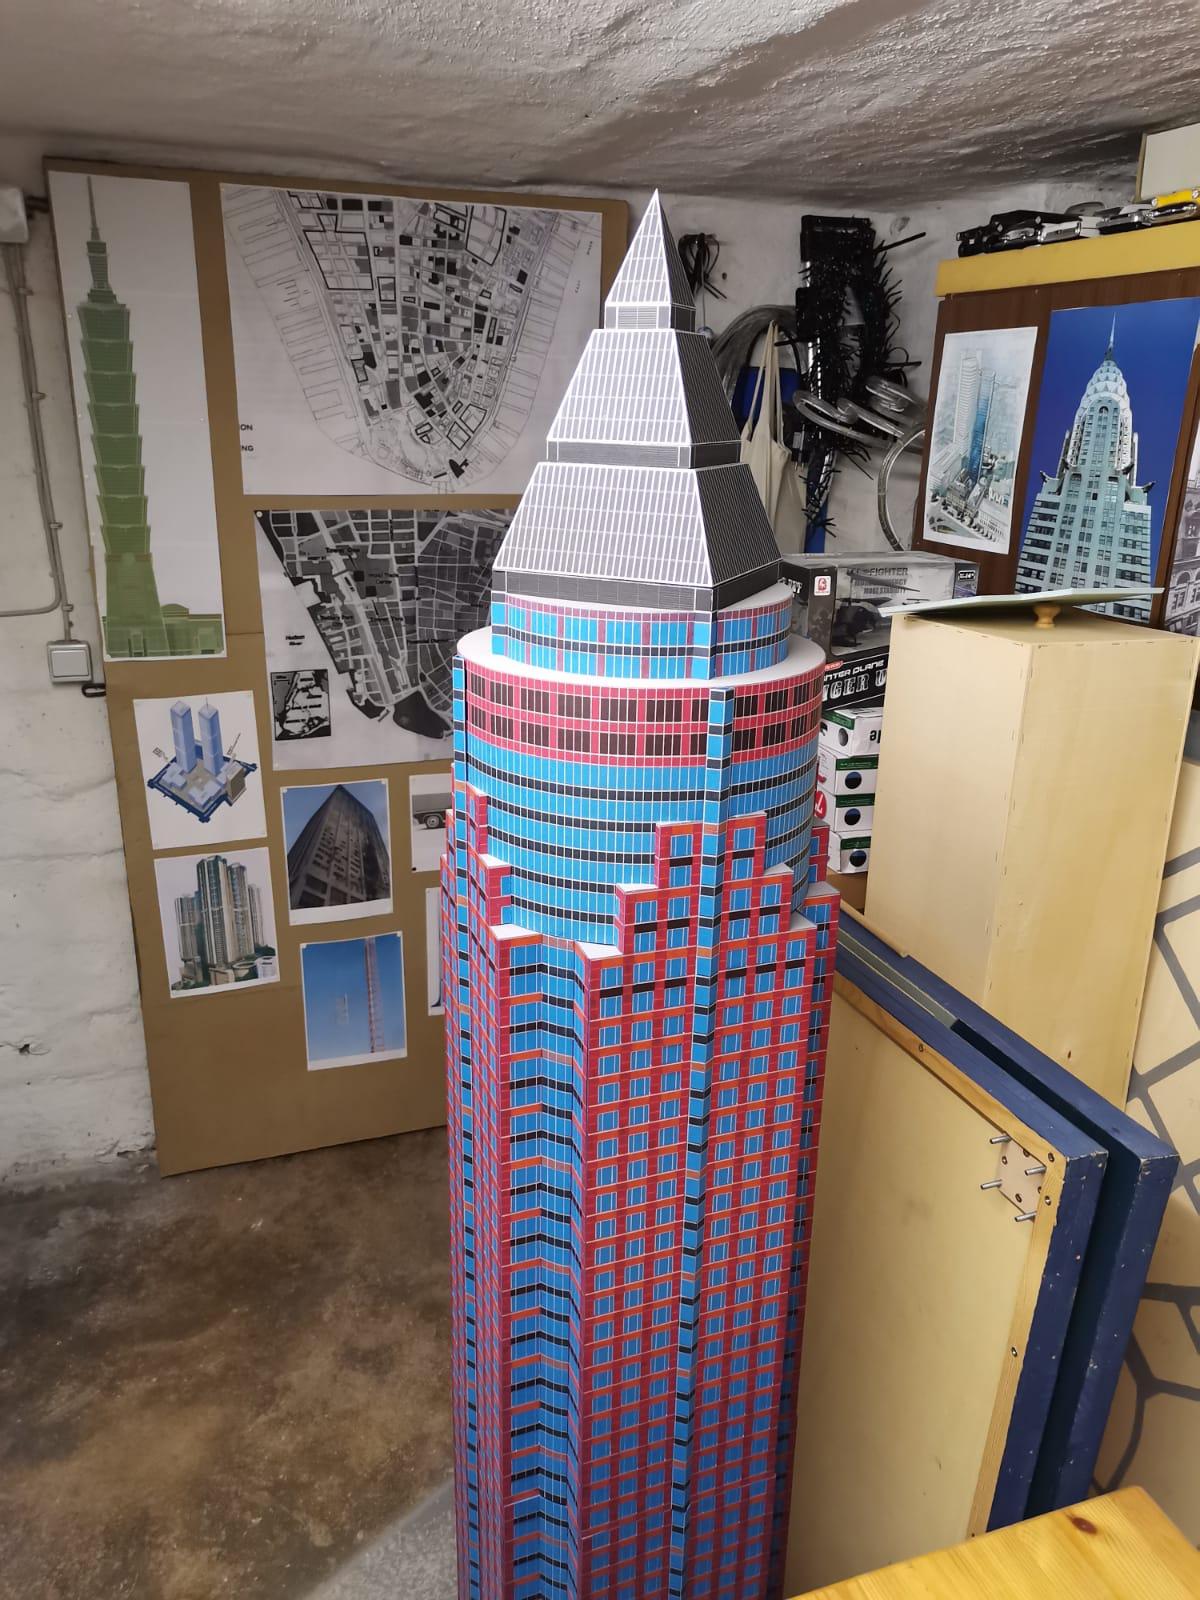 Frankfurt Messeturm Modell von Frank Reuter